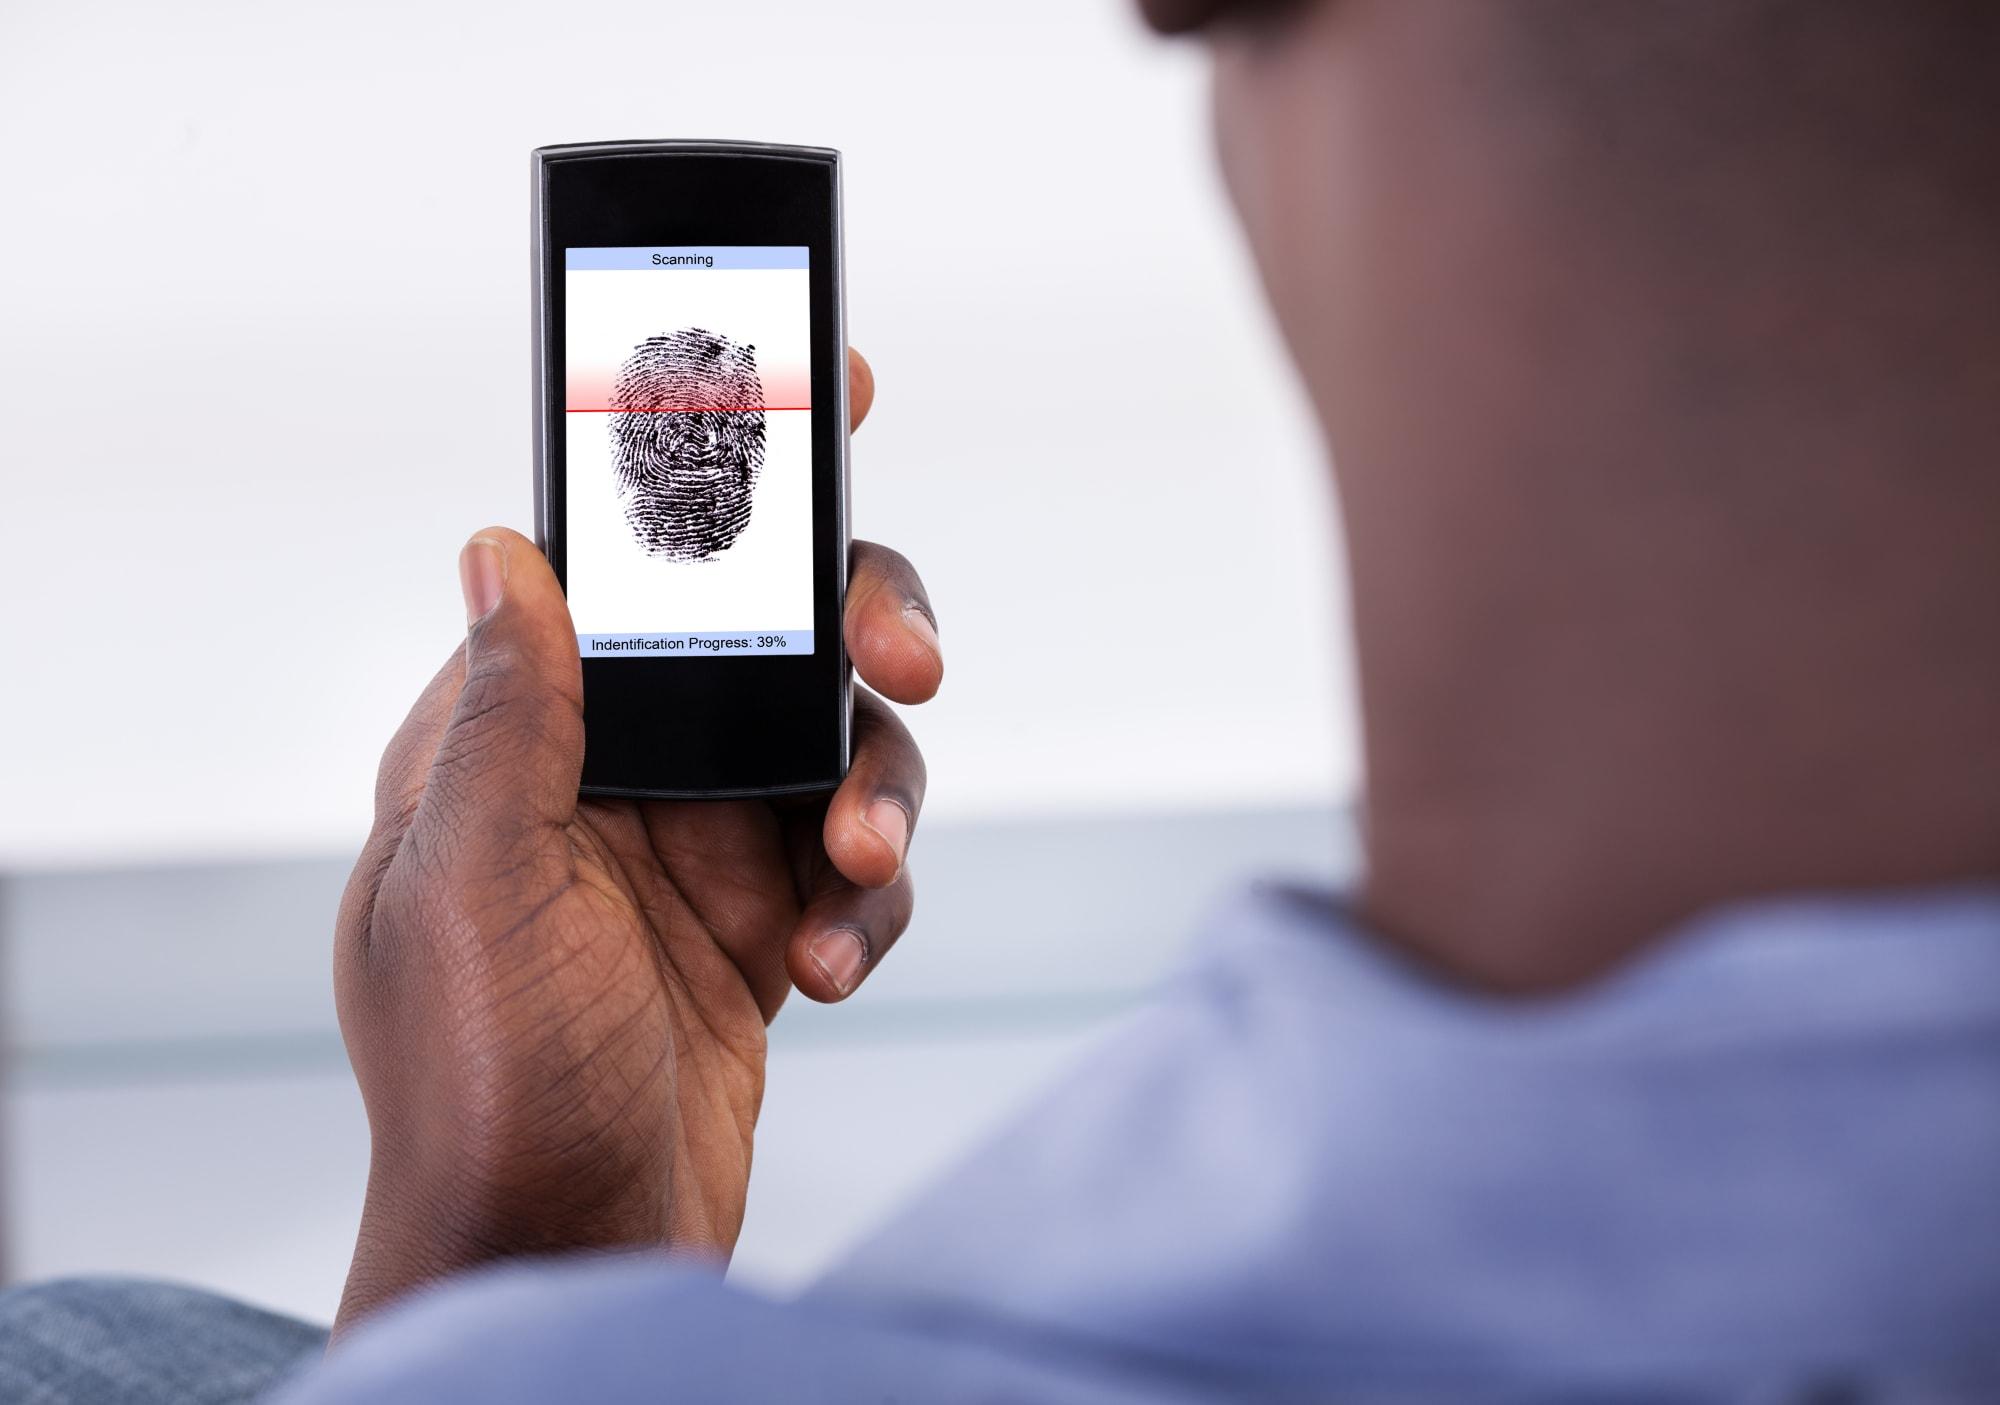 Mobile Phone Authentication Using Fingerprint Scan